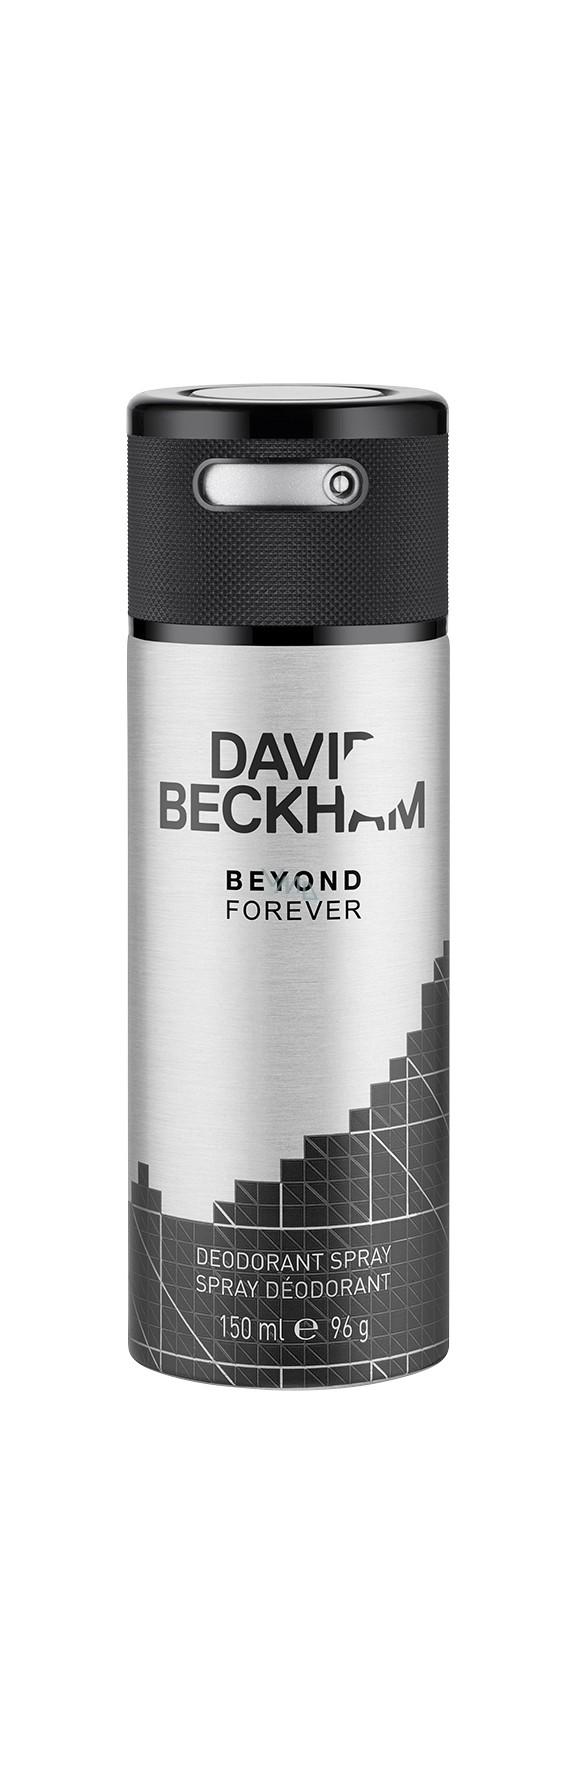 David Beckham - Beyond Forever - Deodorant Spray 150 ml